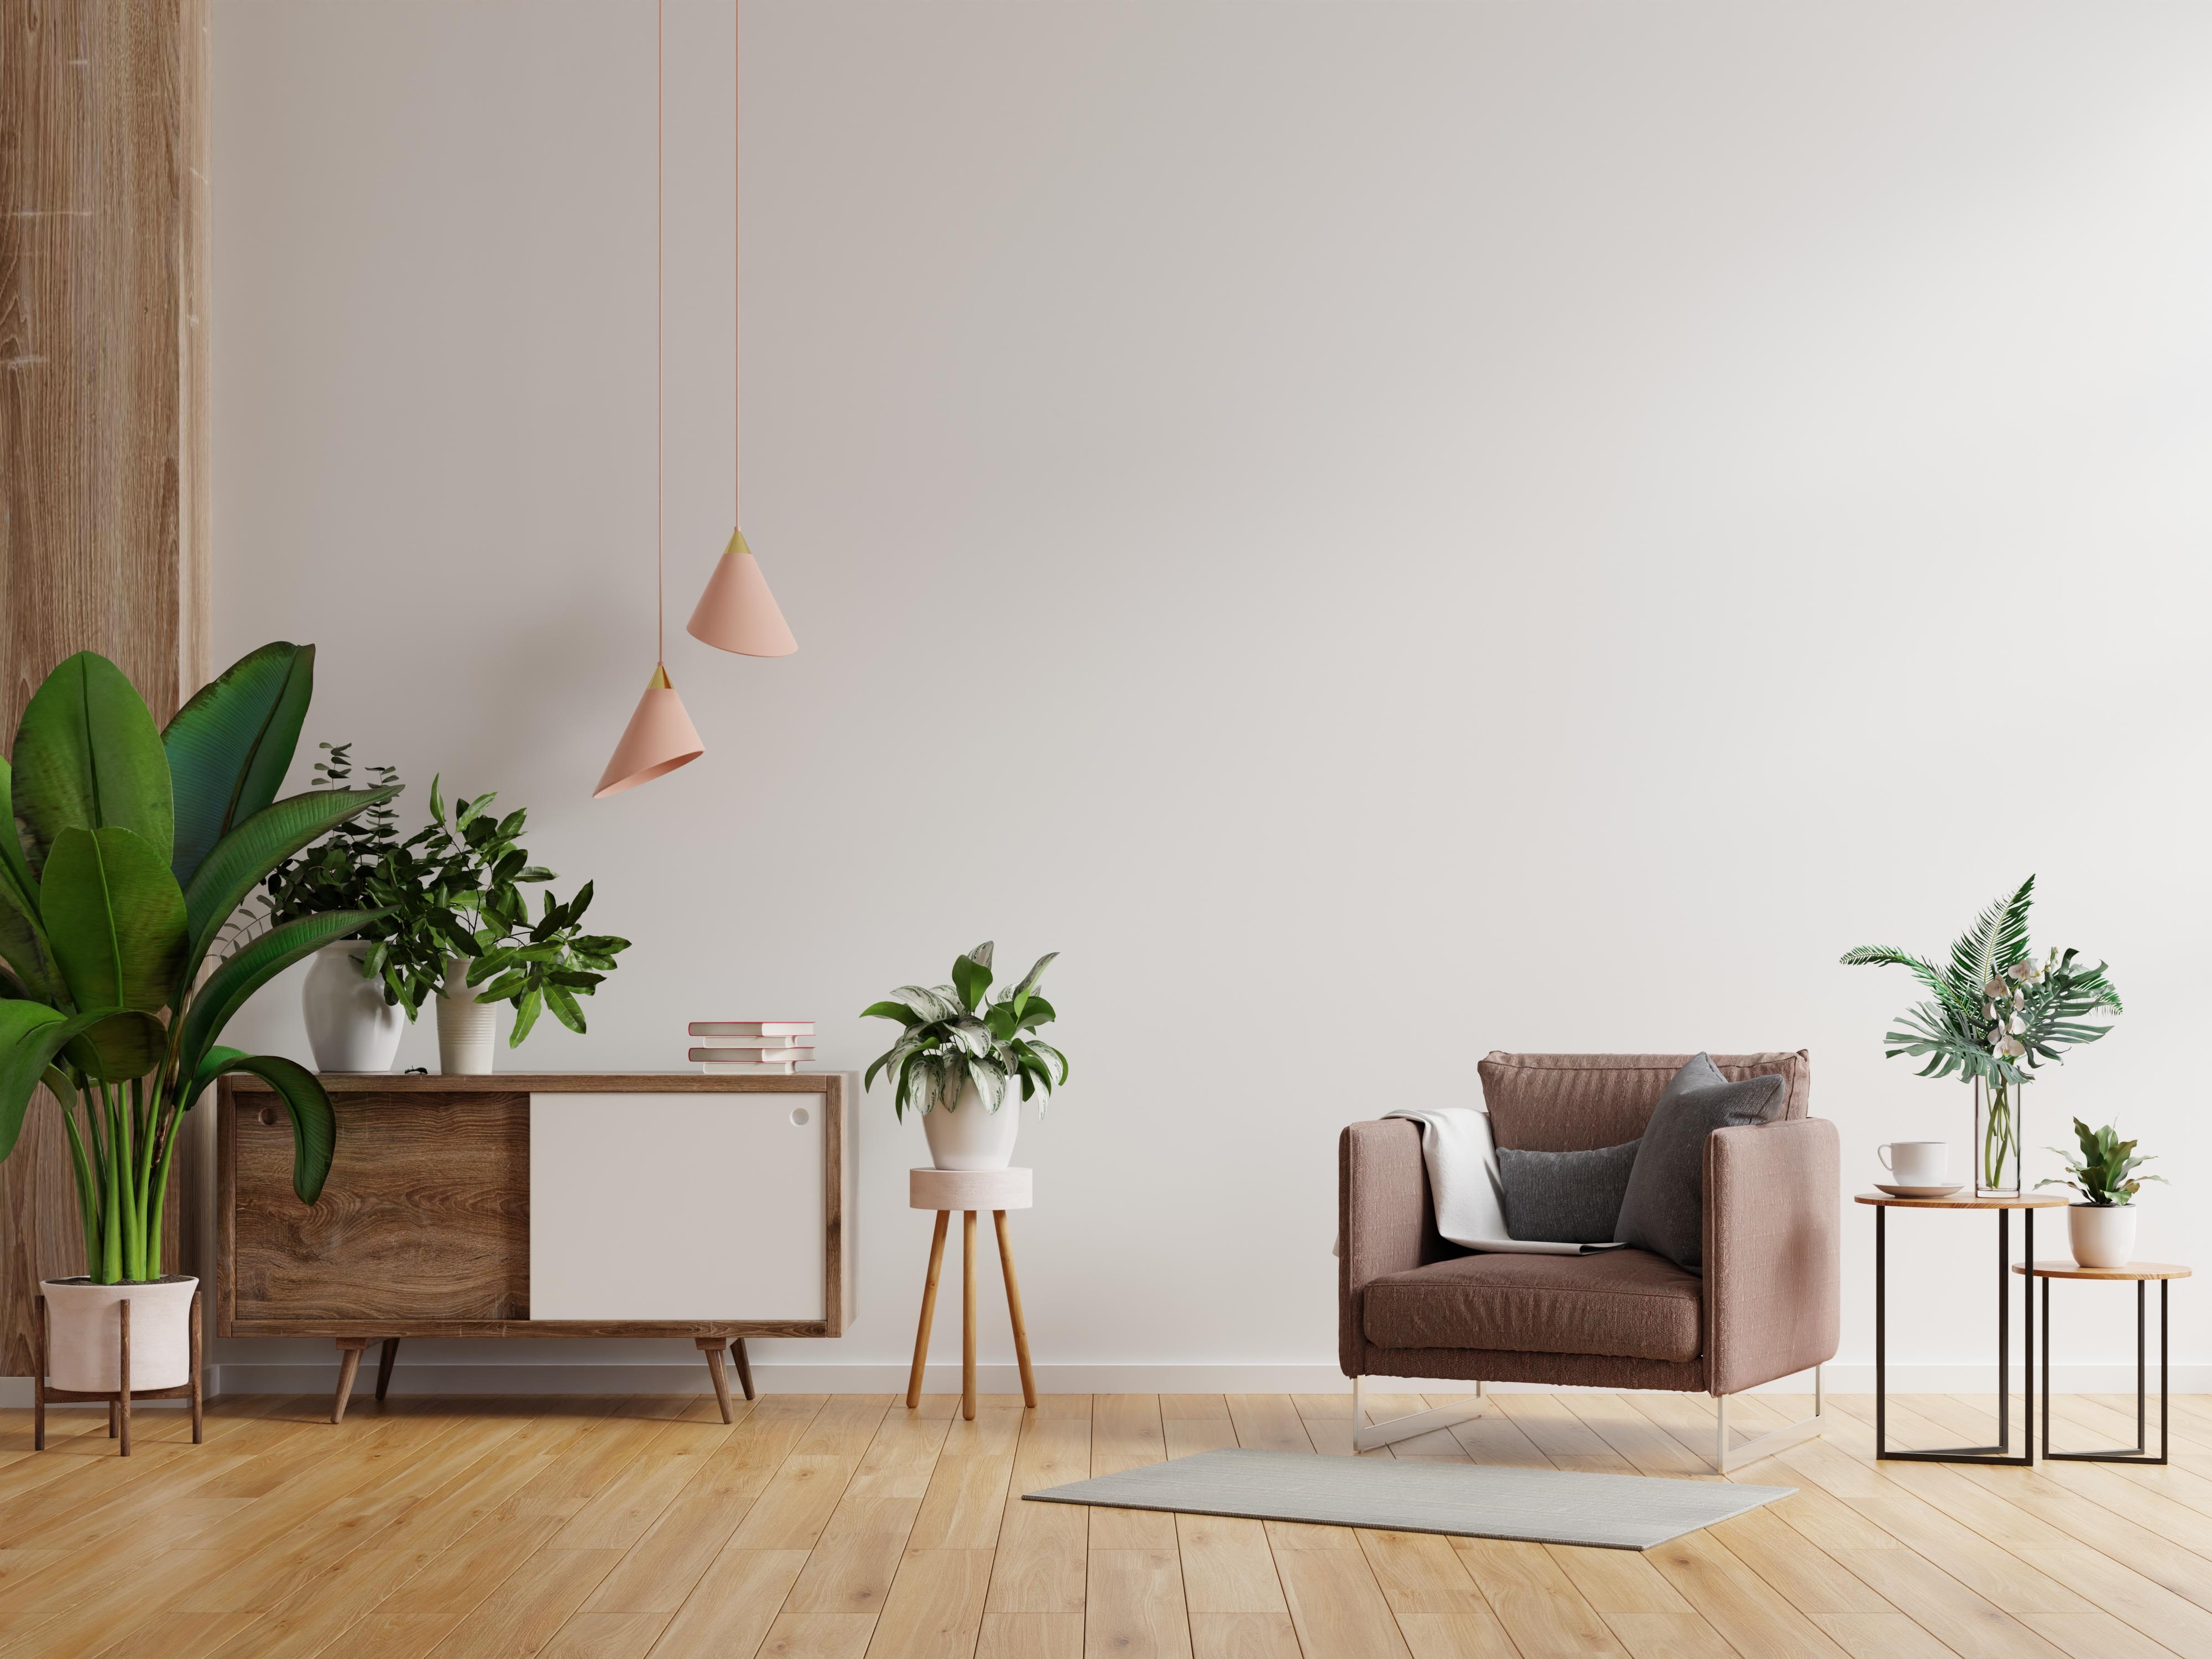 modern-minimalist-interior-with-armchair-empty-white-wall-background-3d-rendering.jpg